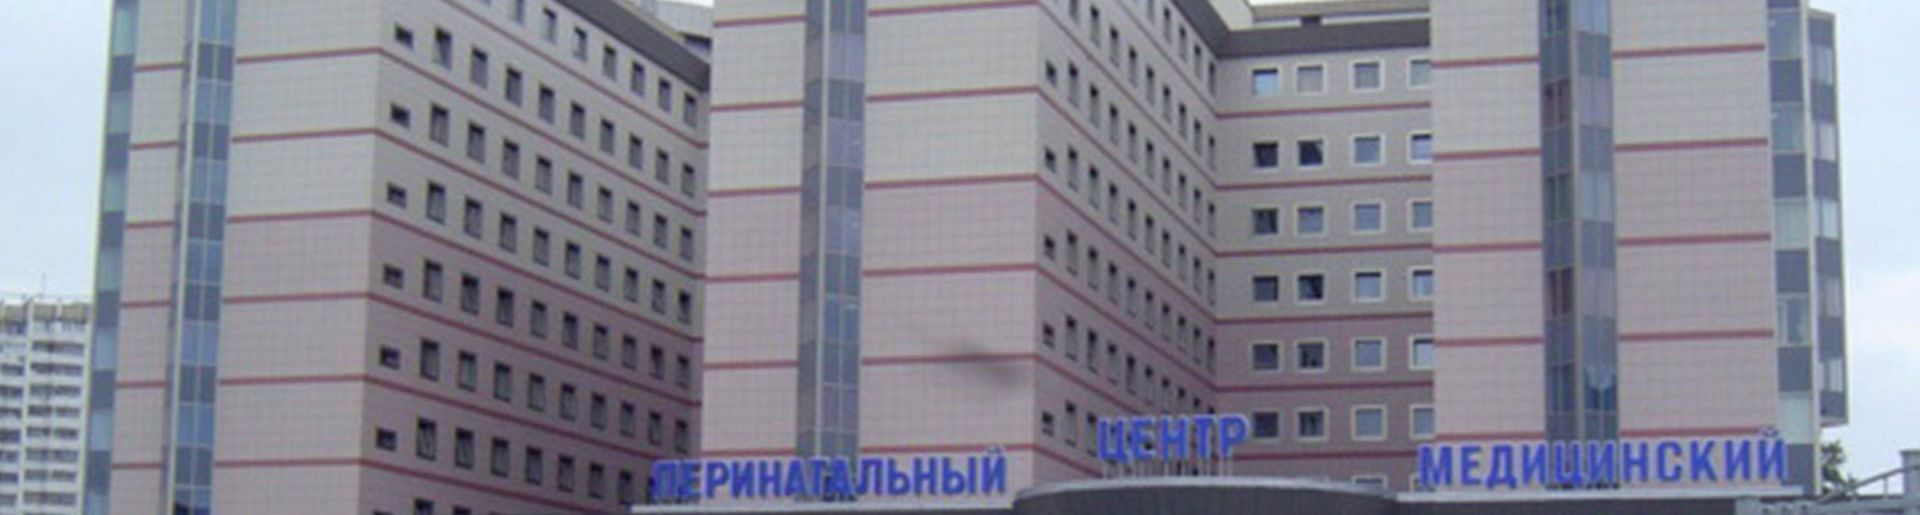 103 Bed Sevastopolsky Perinatal Medical Centre